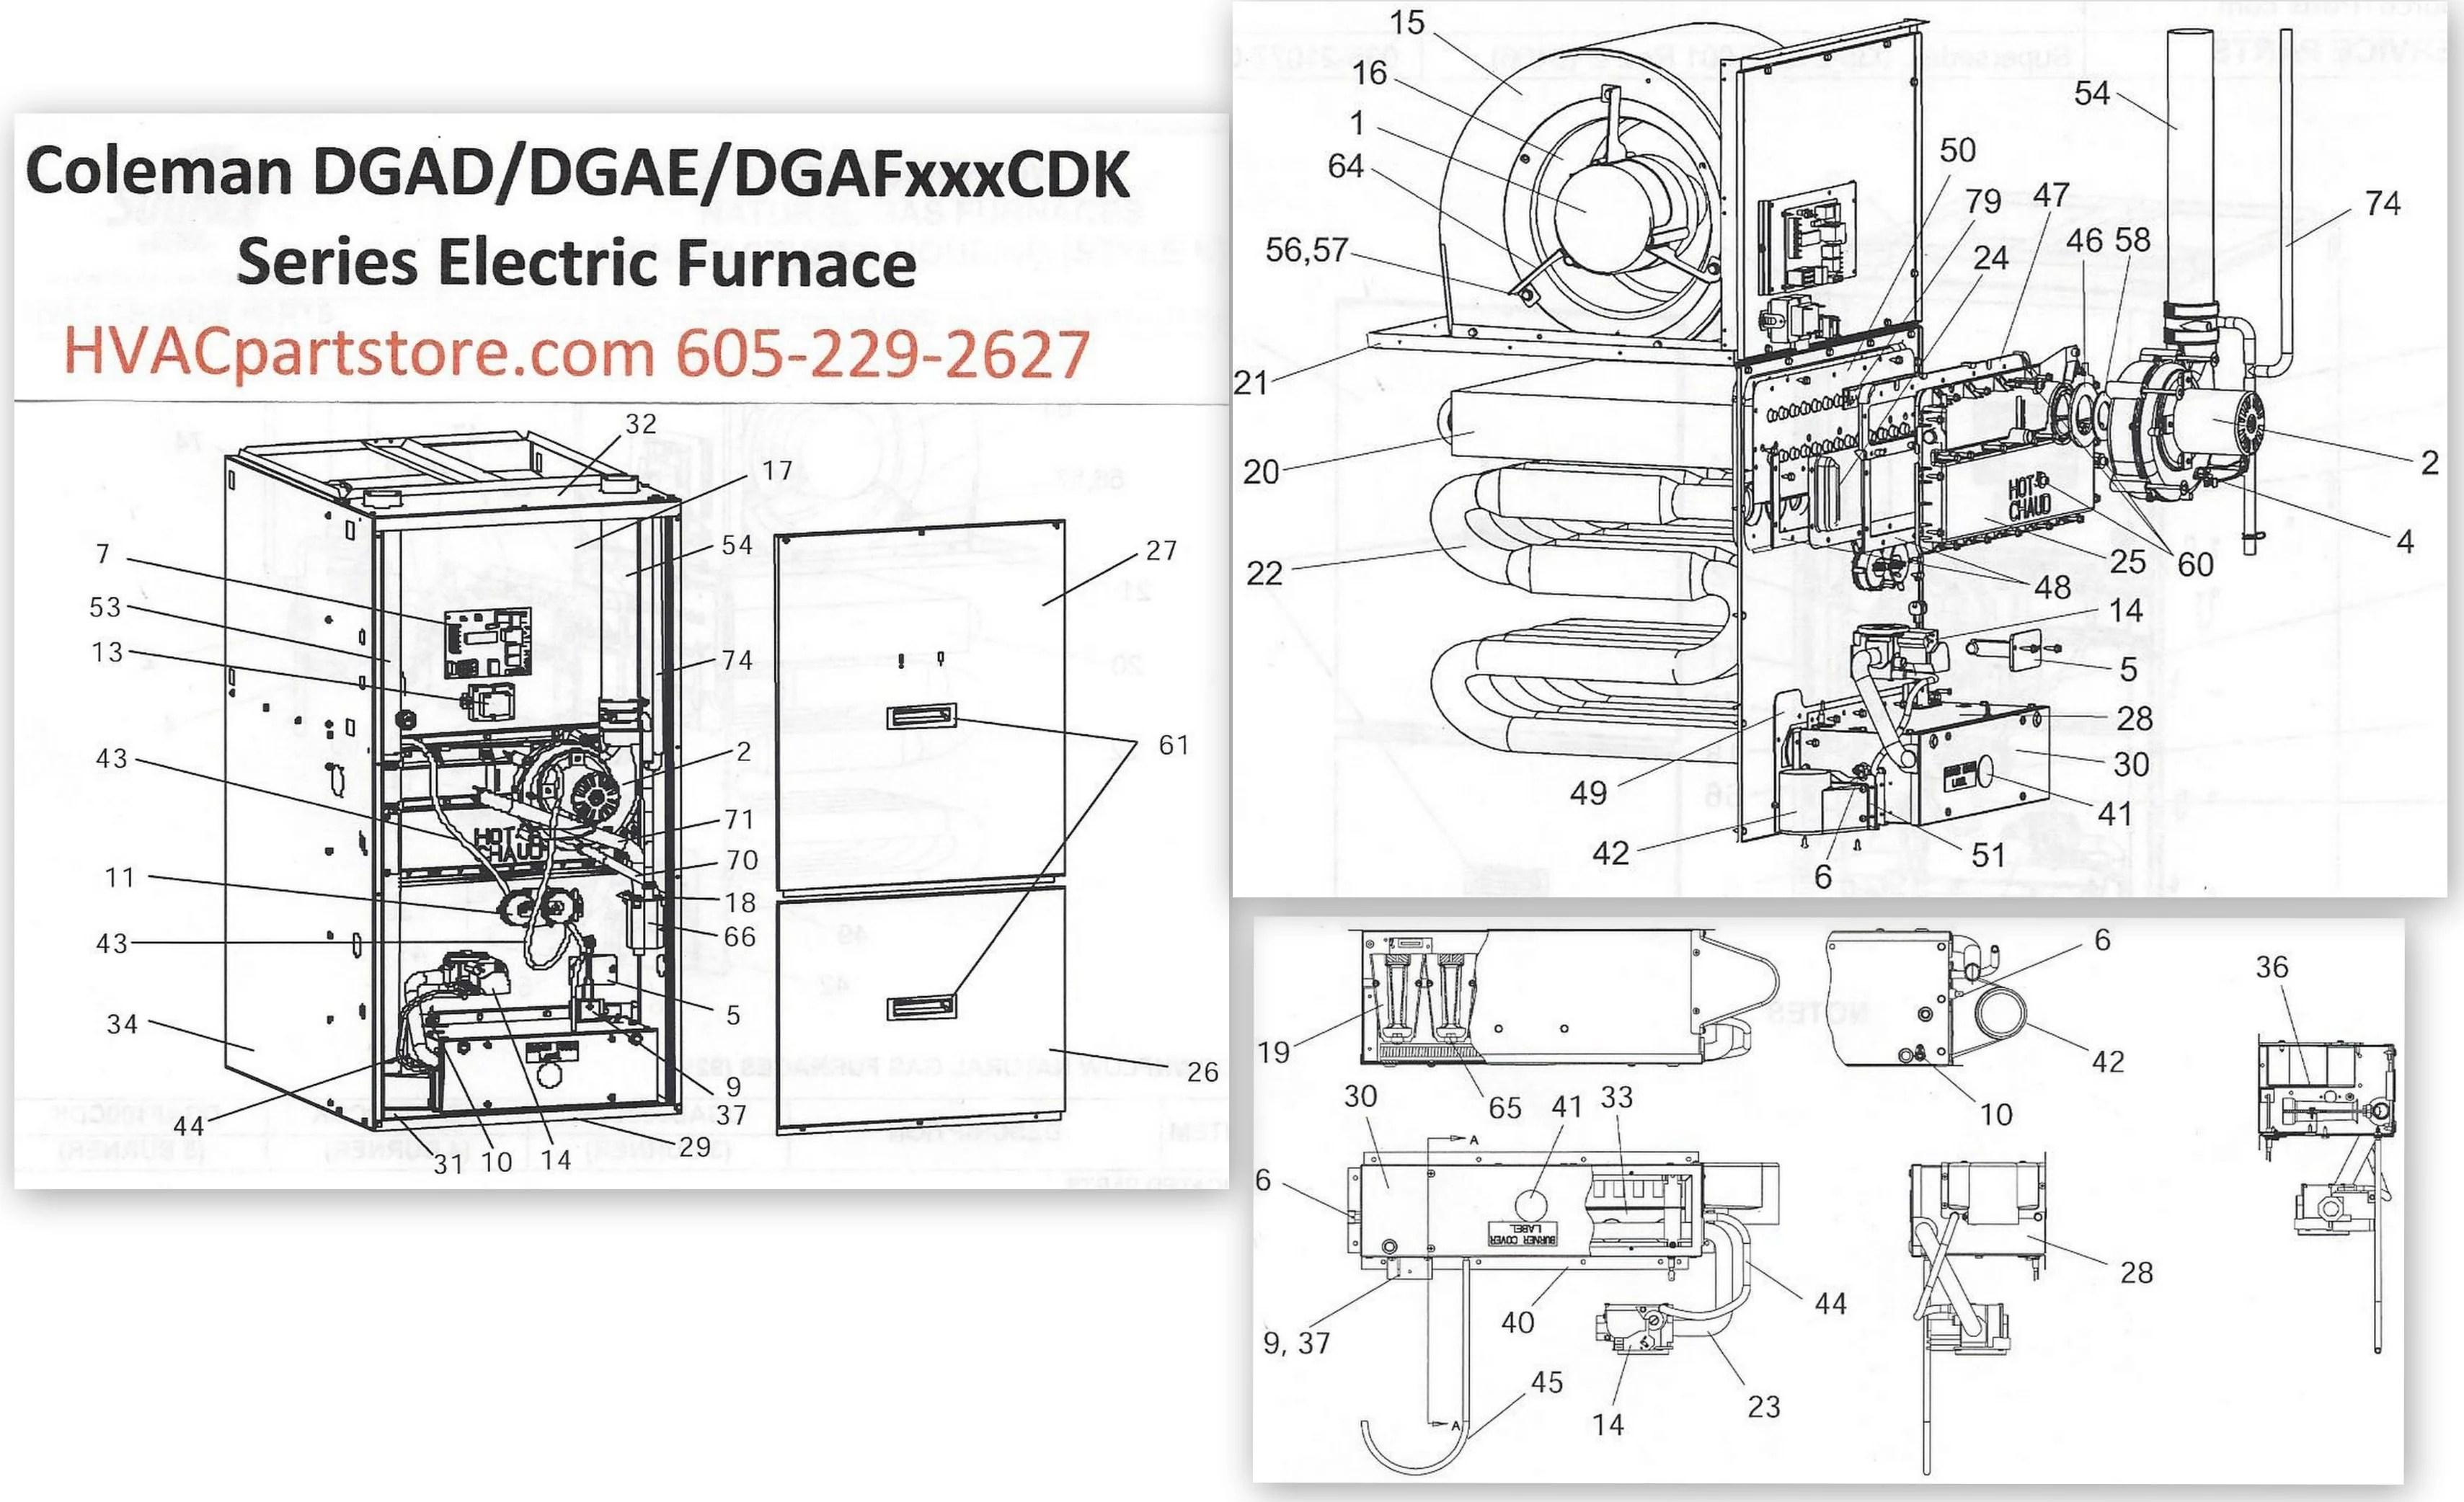 coleman mobile home gas furnace wiring diagram teleflex marine gauges dgae080cdk parts  hvacpartstore